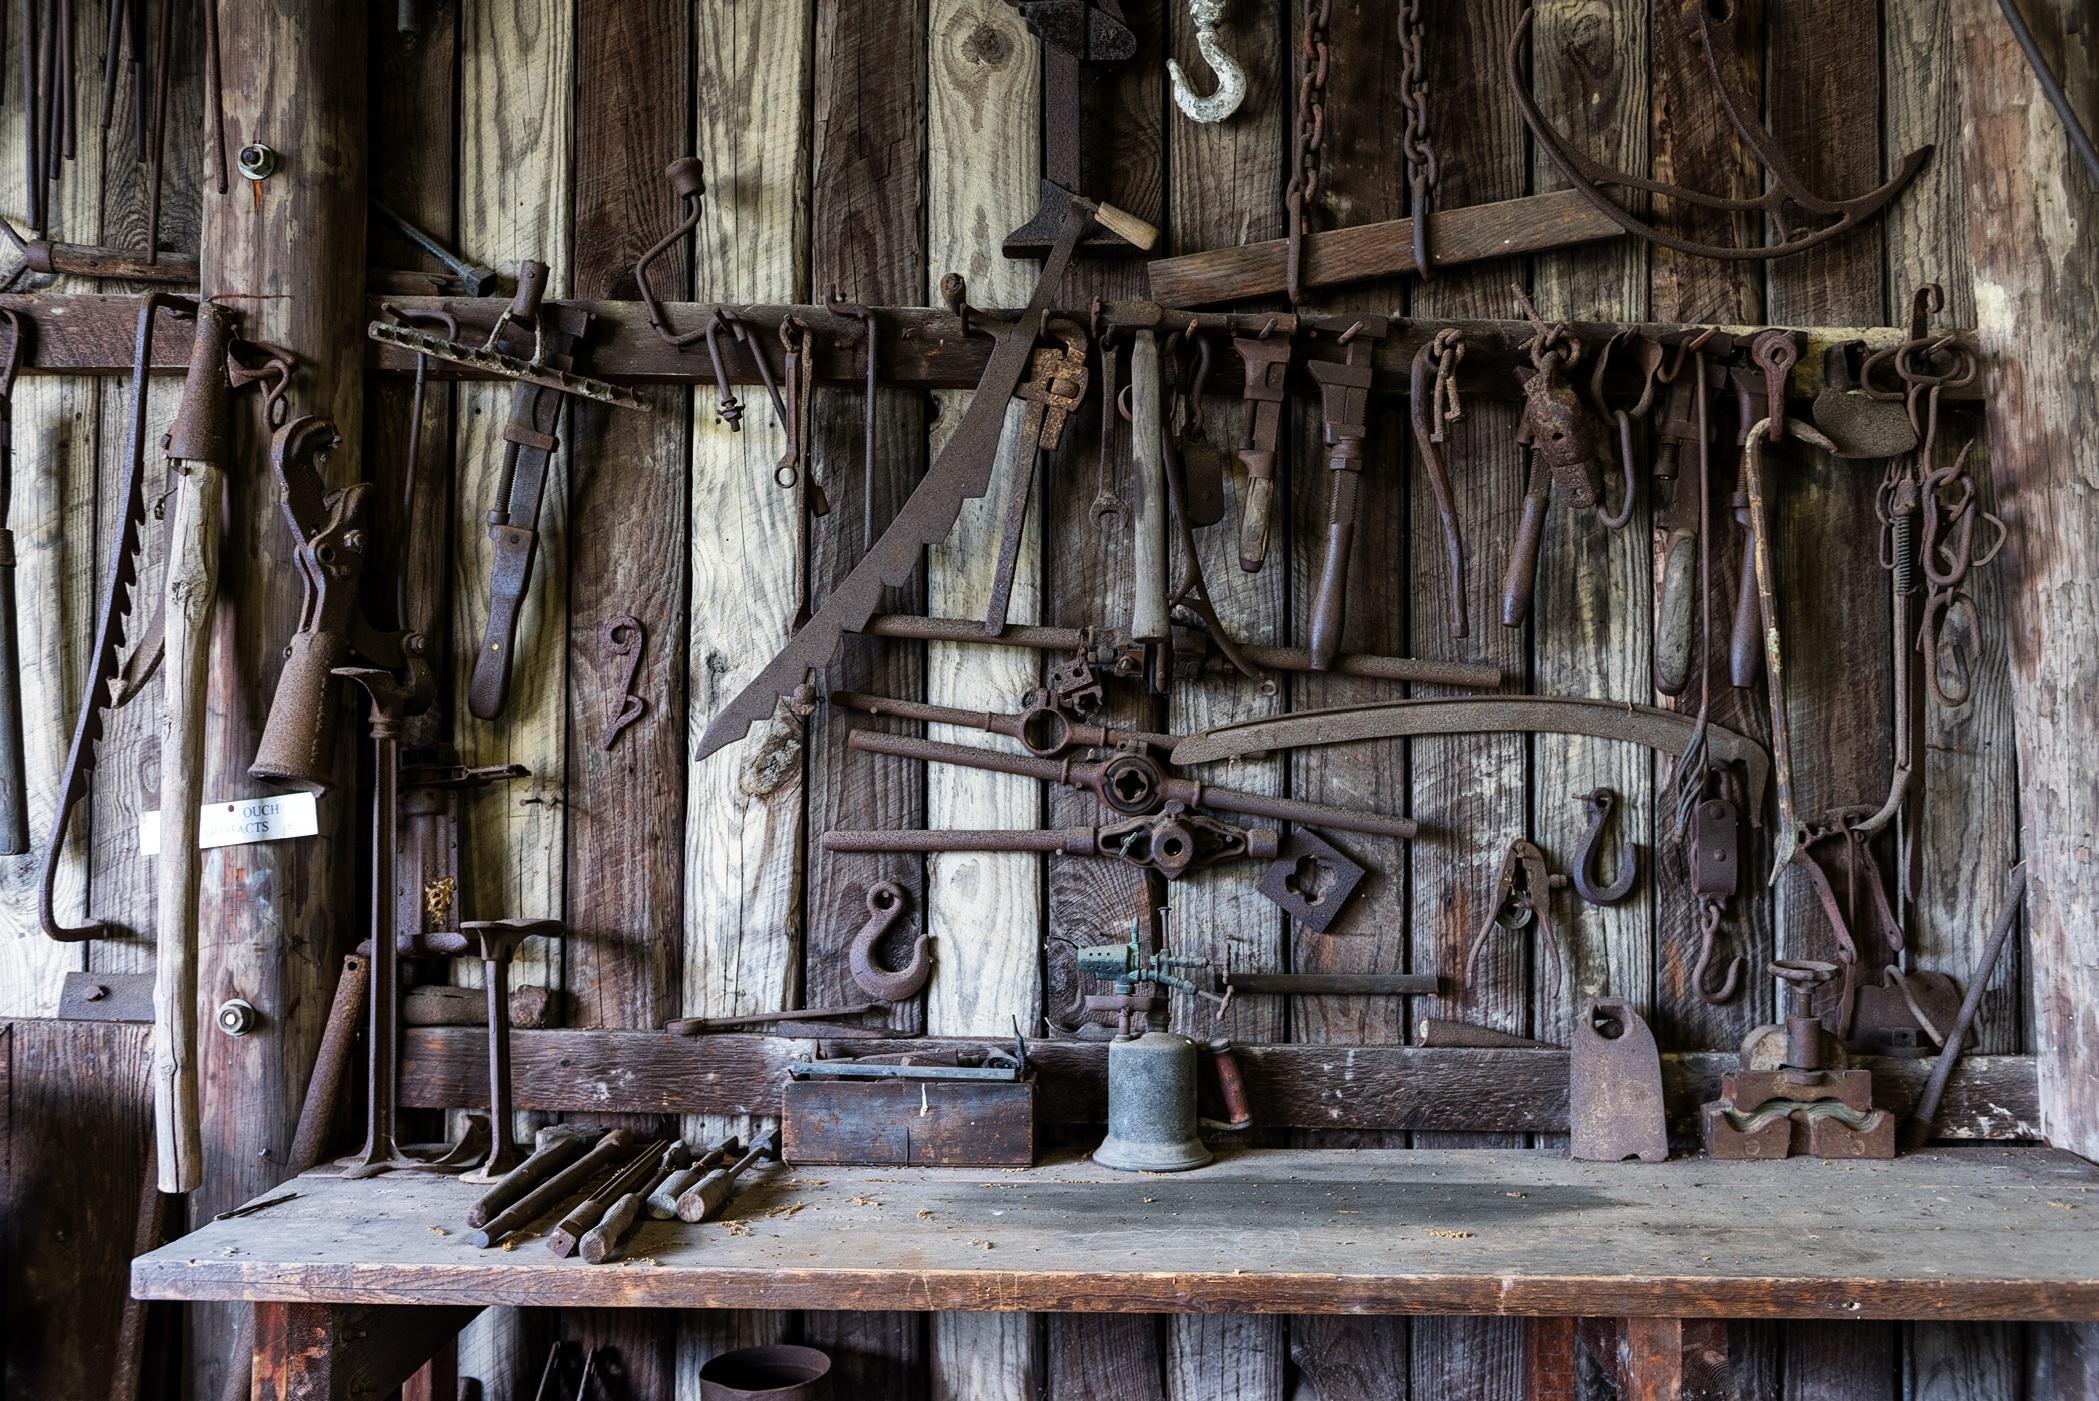 Free stock photos of tools · Pexels